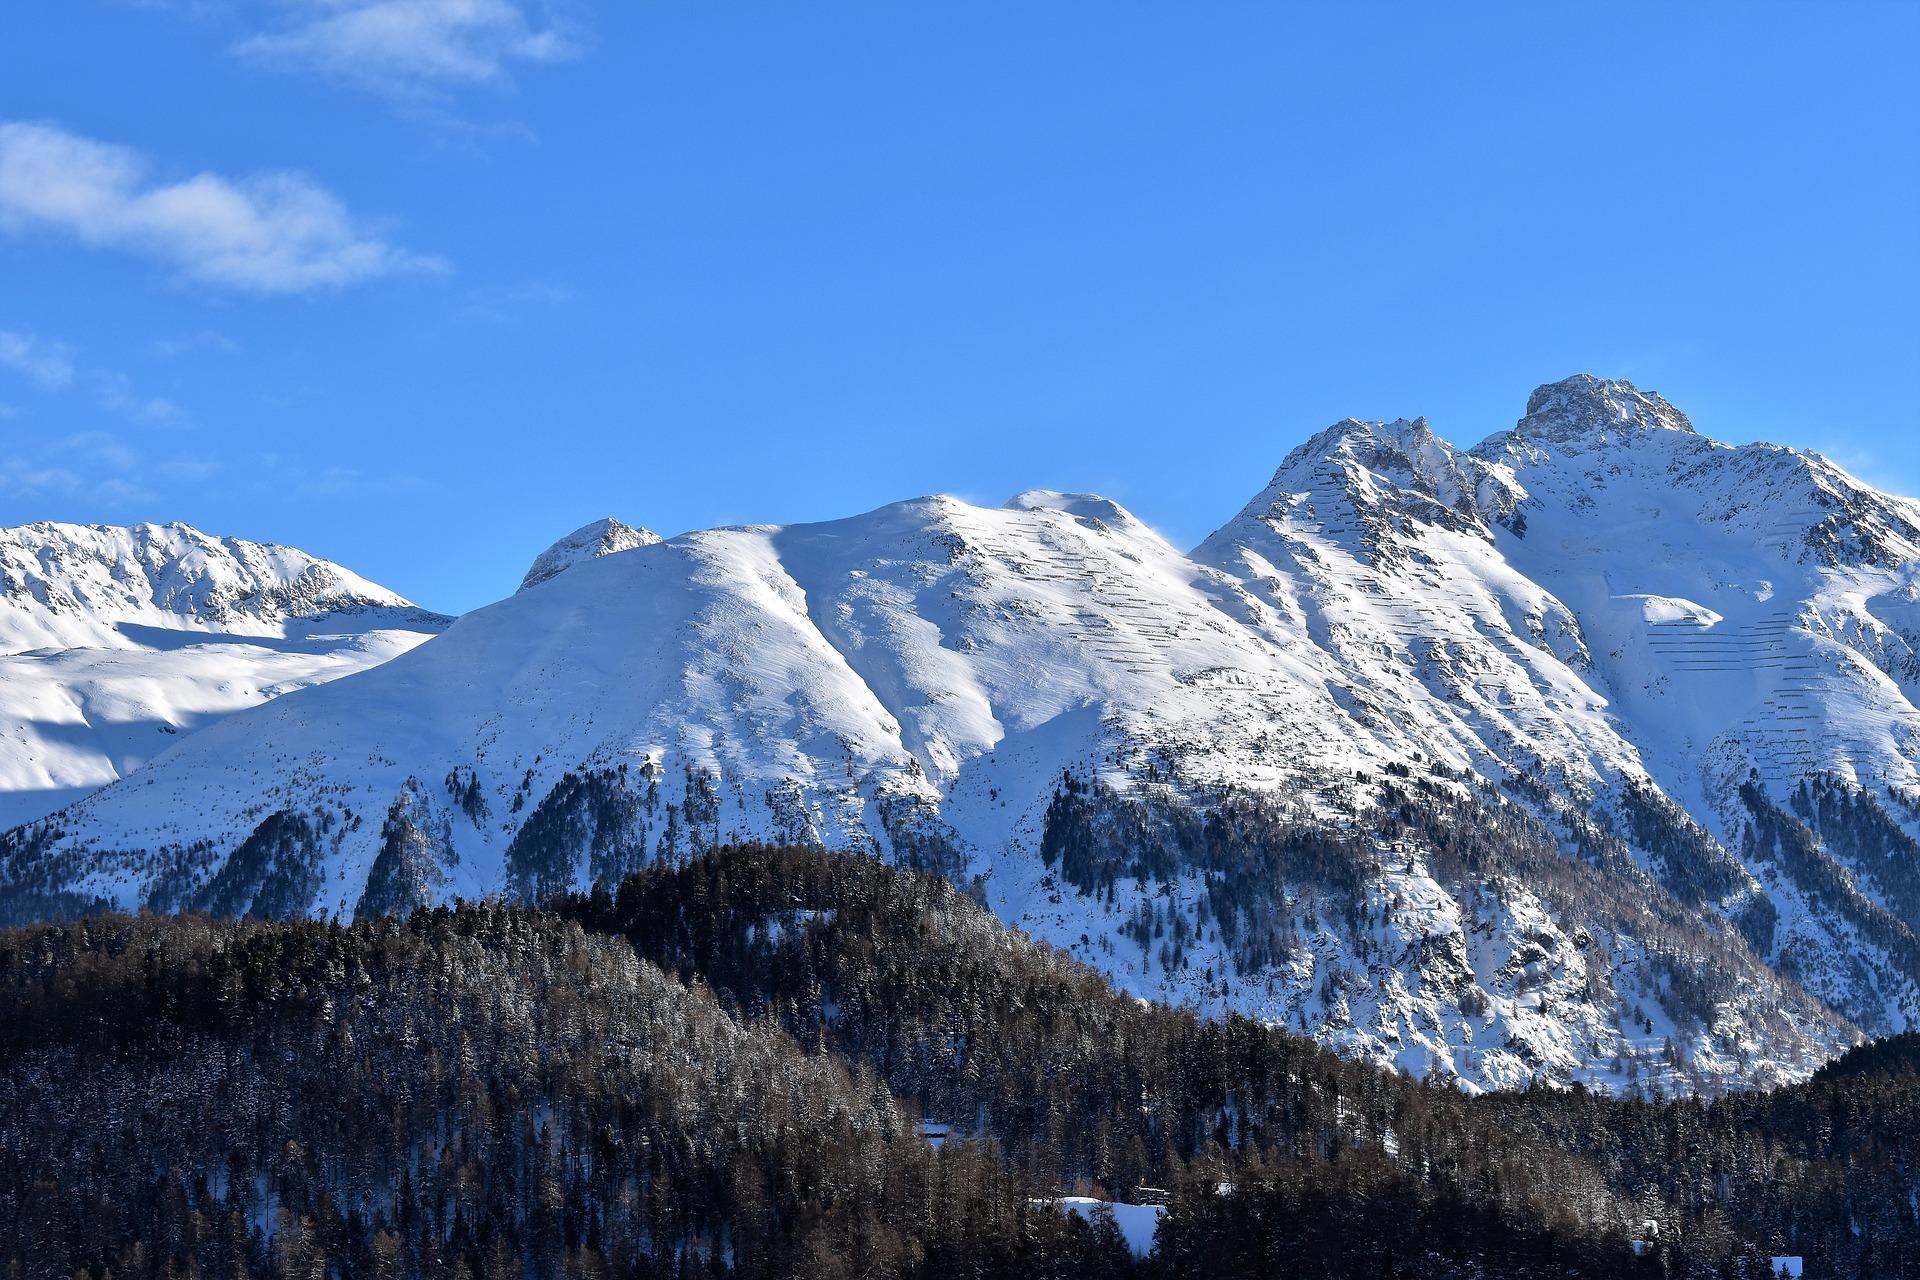 https://pixabay.com/ja/冬-山-スキー場-斜面-冬の-st-サンモリッツ-スイス-3937814/